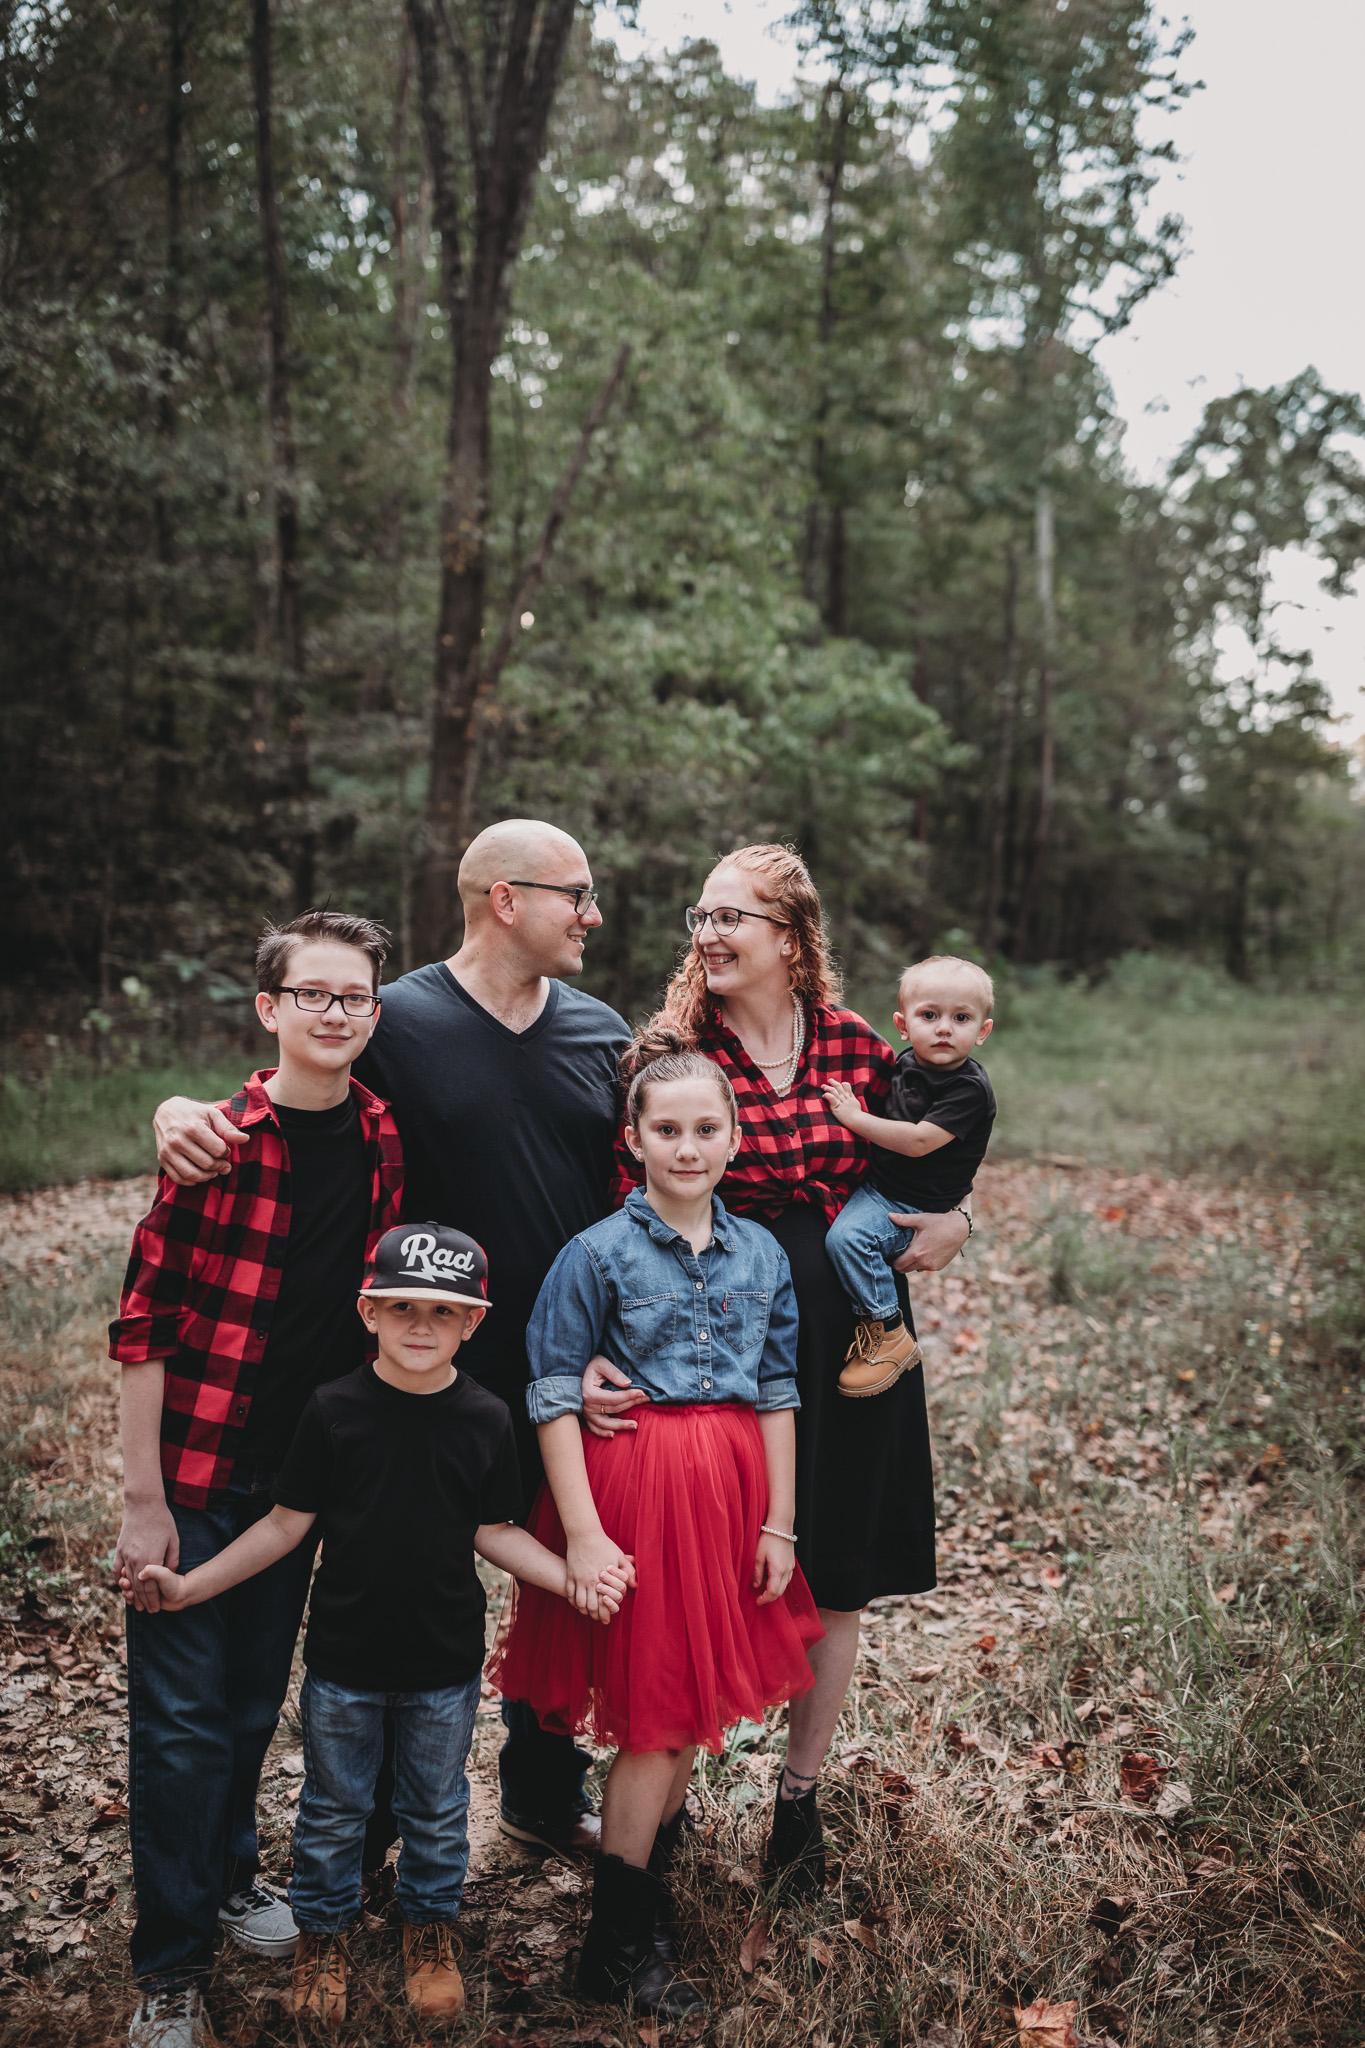 family of 6 posing ideas